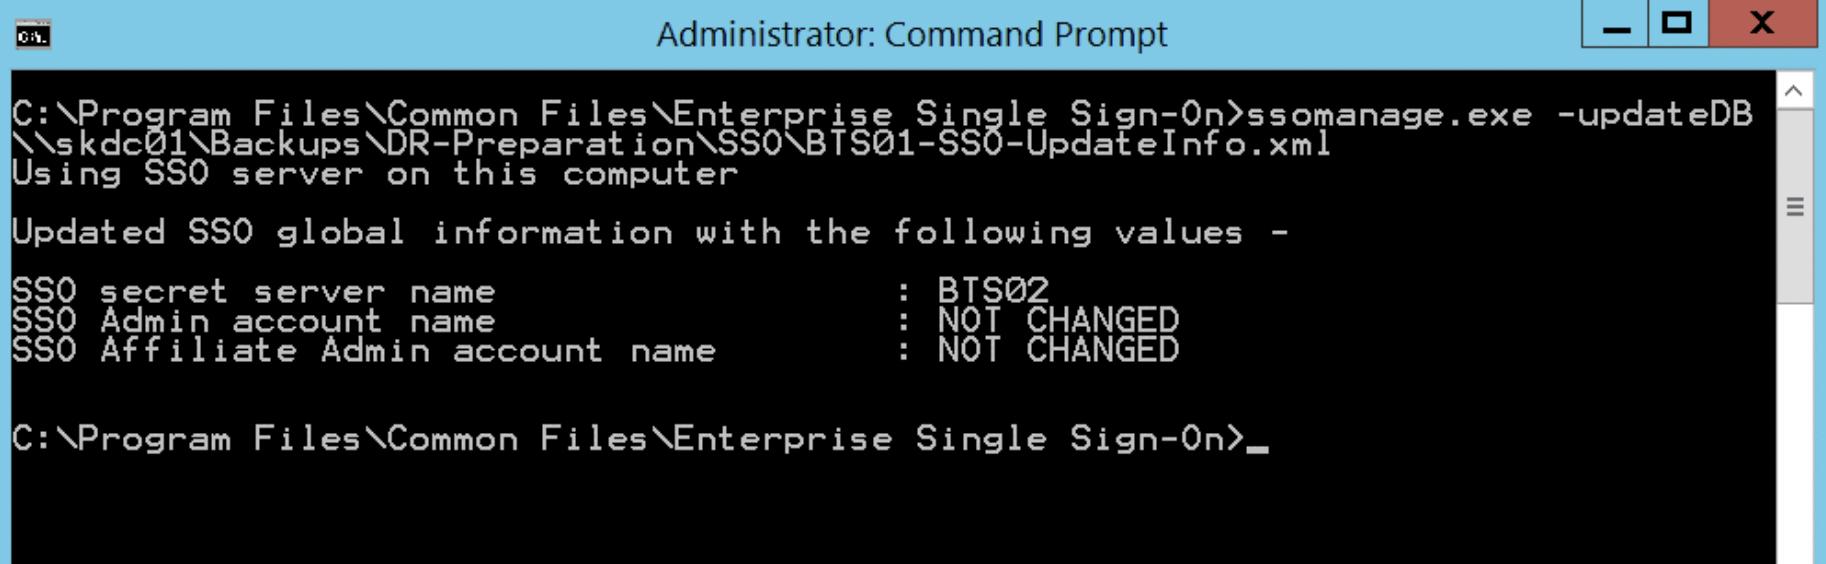 Type ssomanage -updatedb %ENV%-SSO-UpdateInfo.xml to update the master secret server name in the database